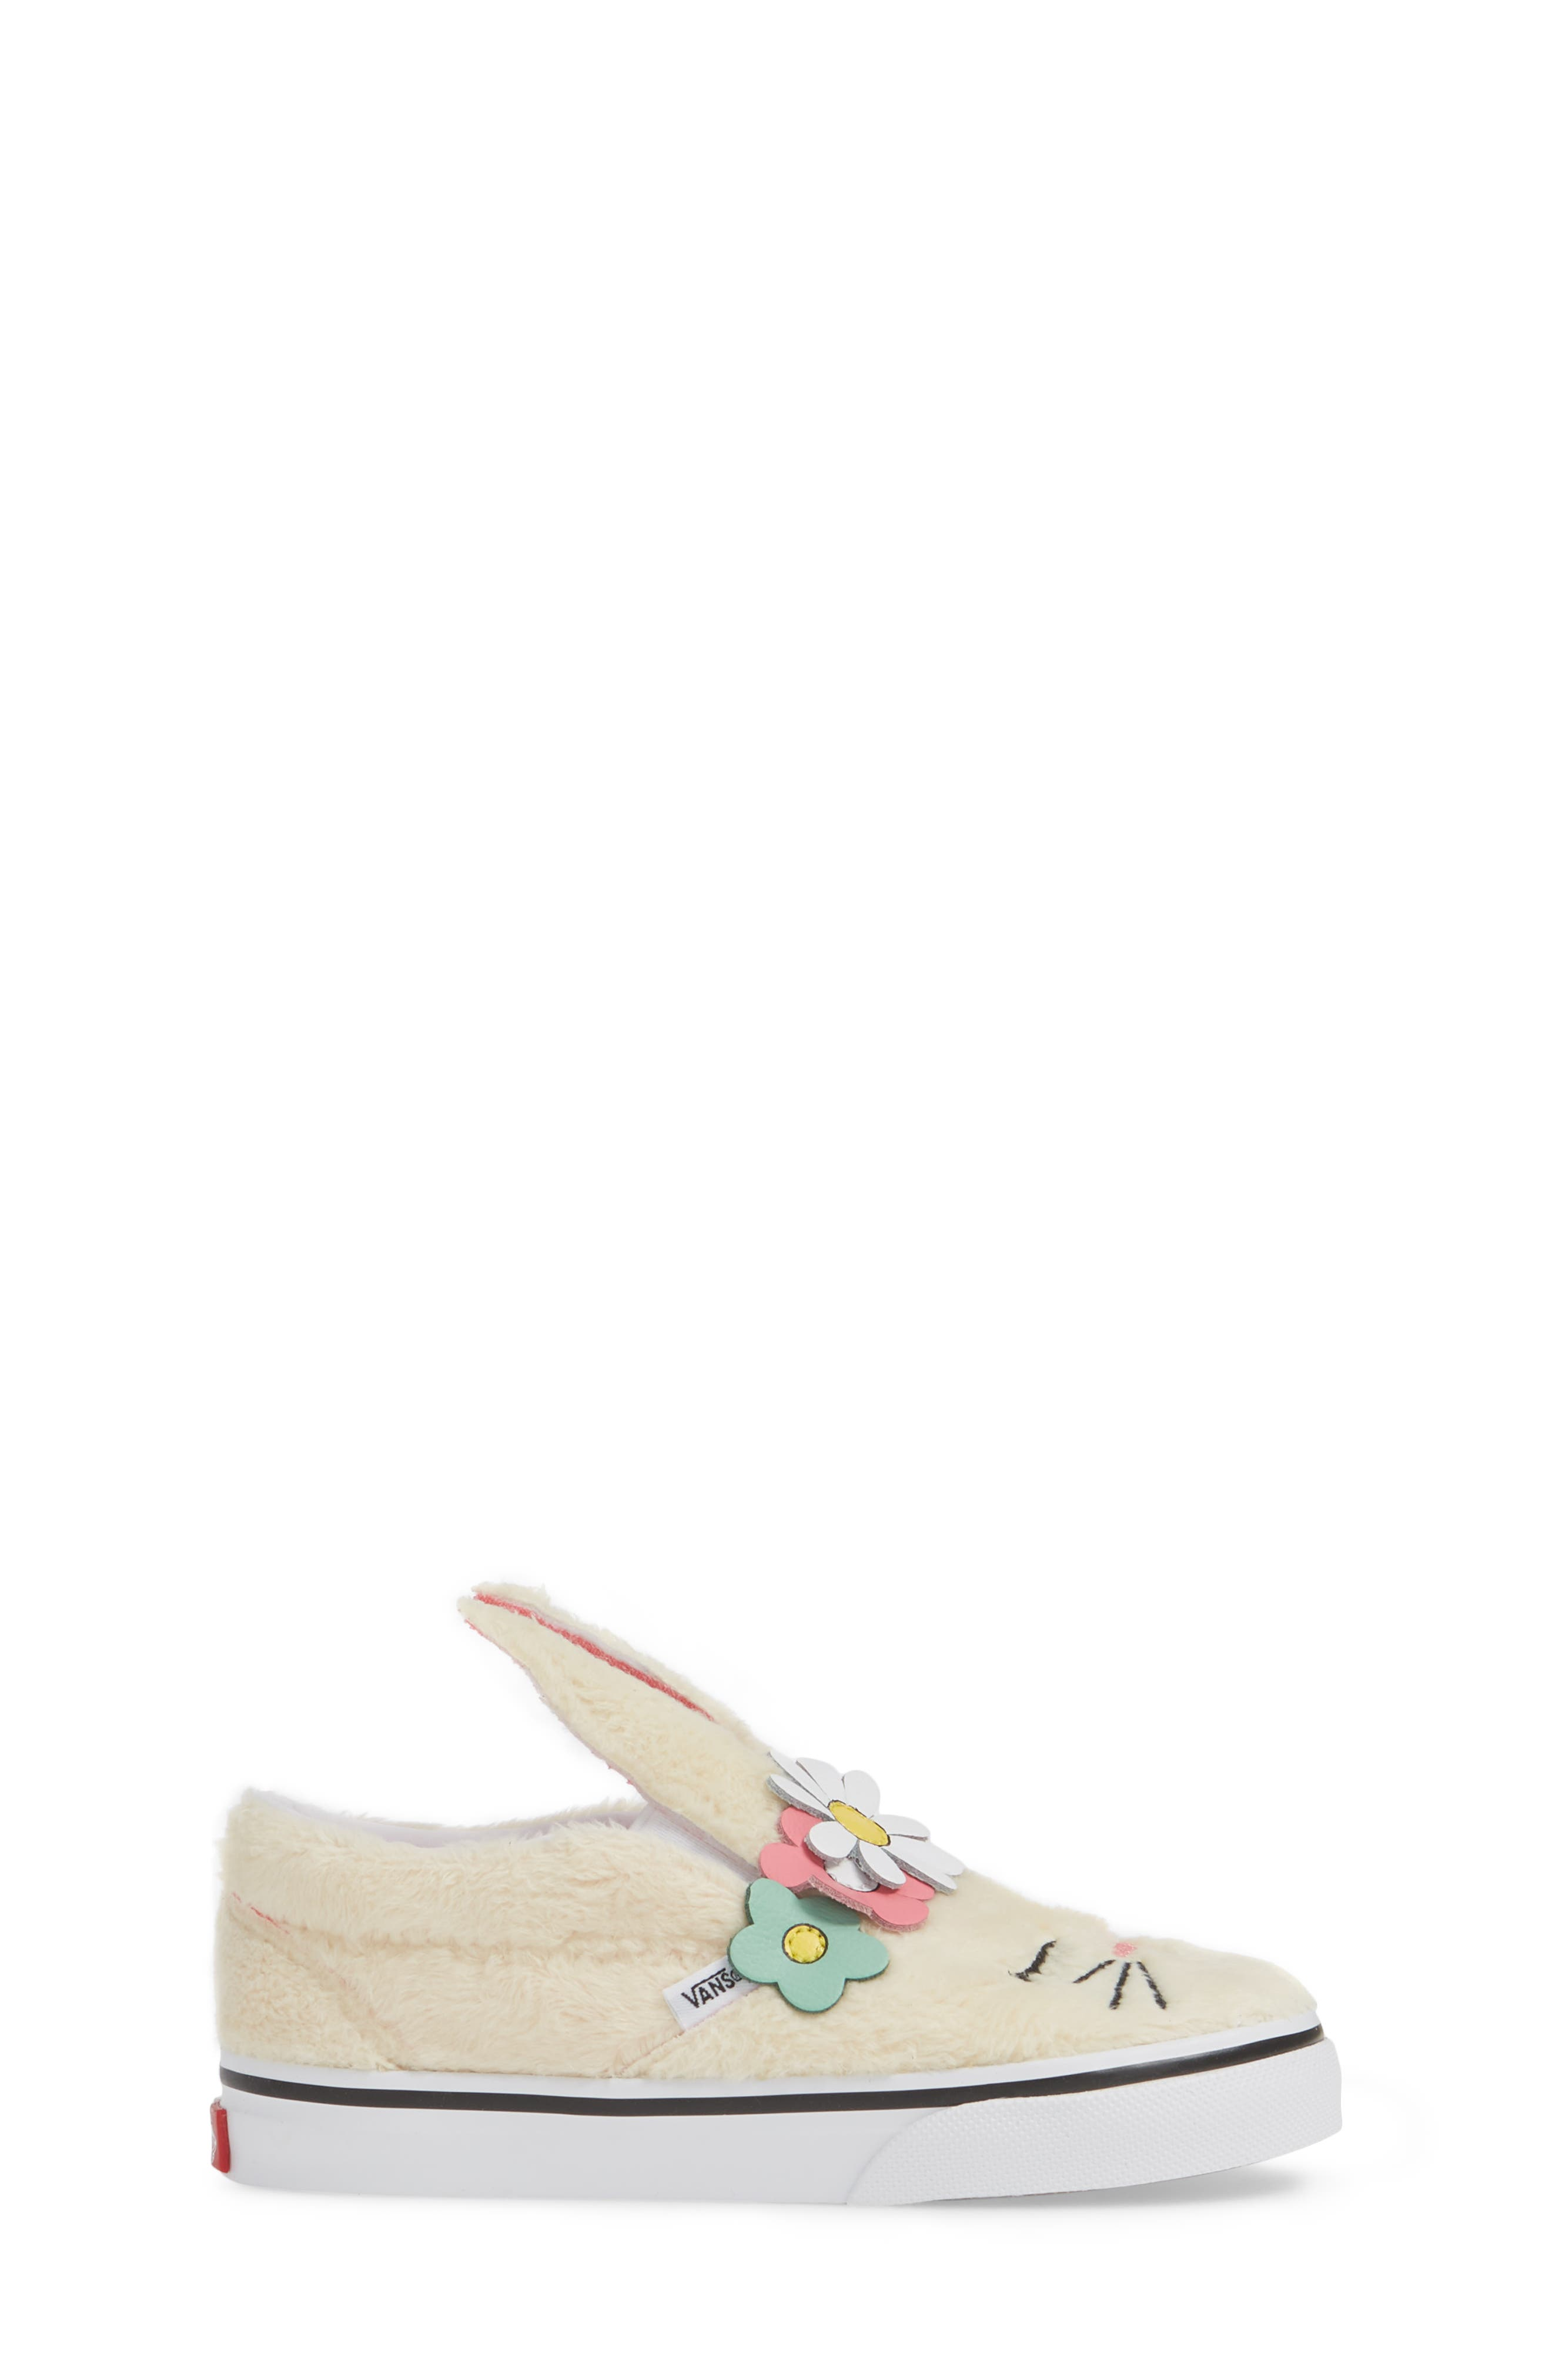 VANS, Slip-On Bunny Sneaker, Alternate thumbnail 3, color, VANILLA CUSTARD